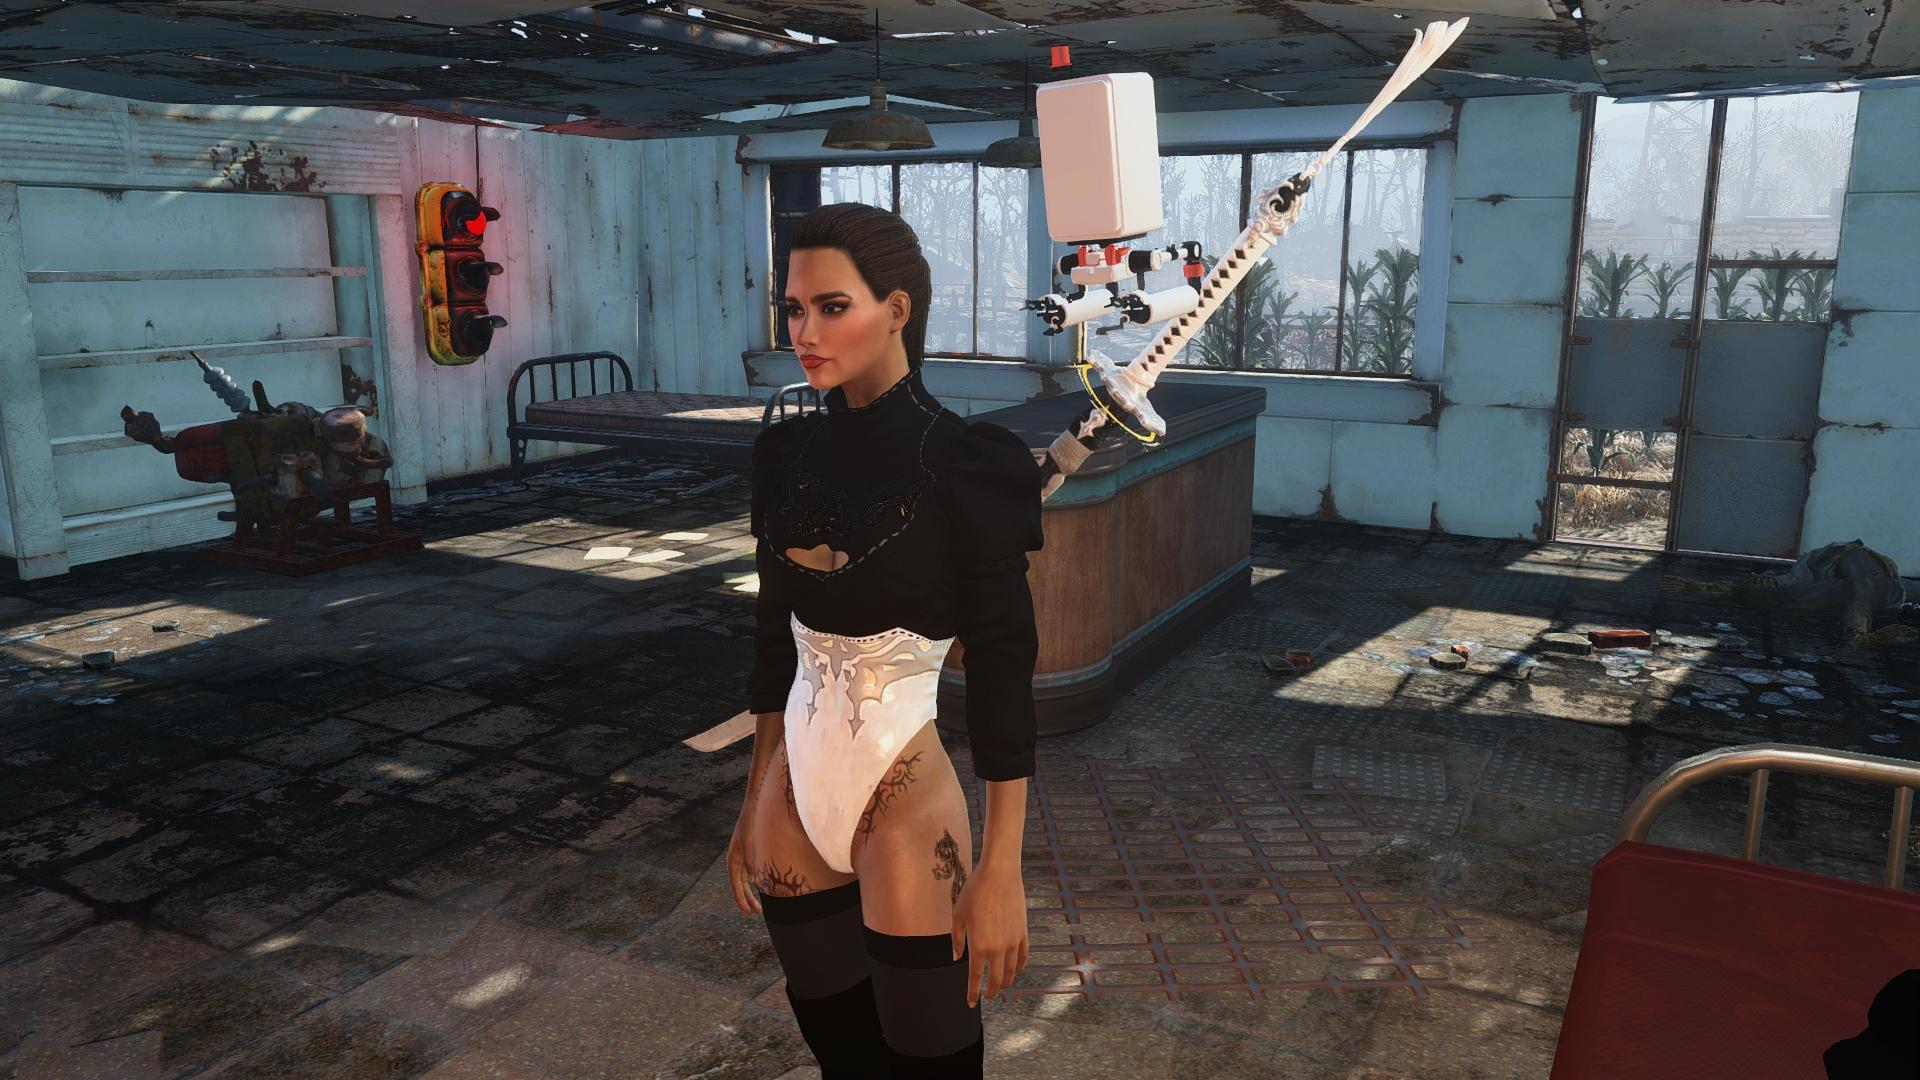 00032.Jpg - Fallout 4